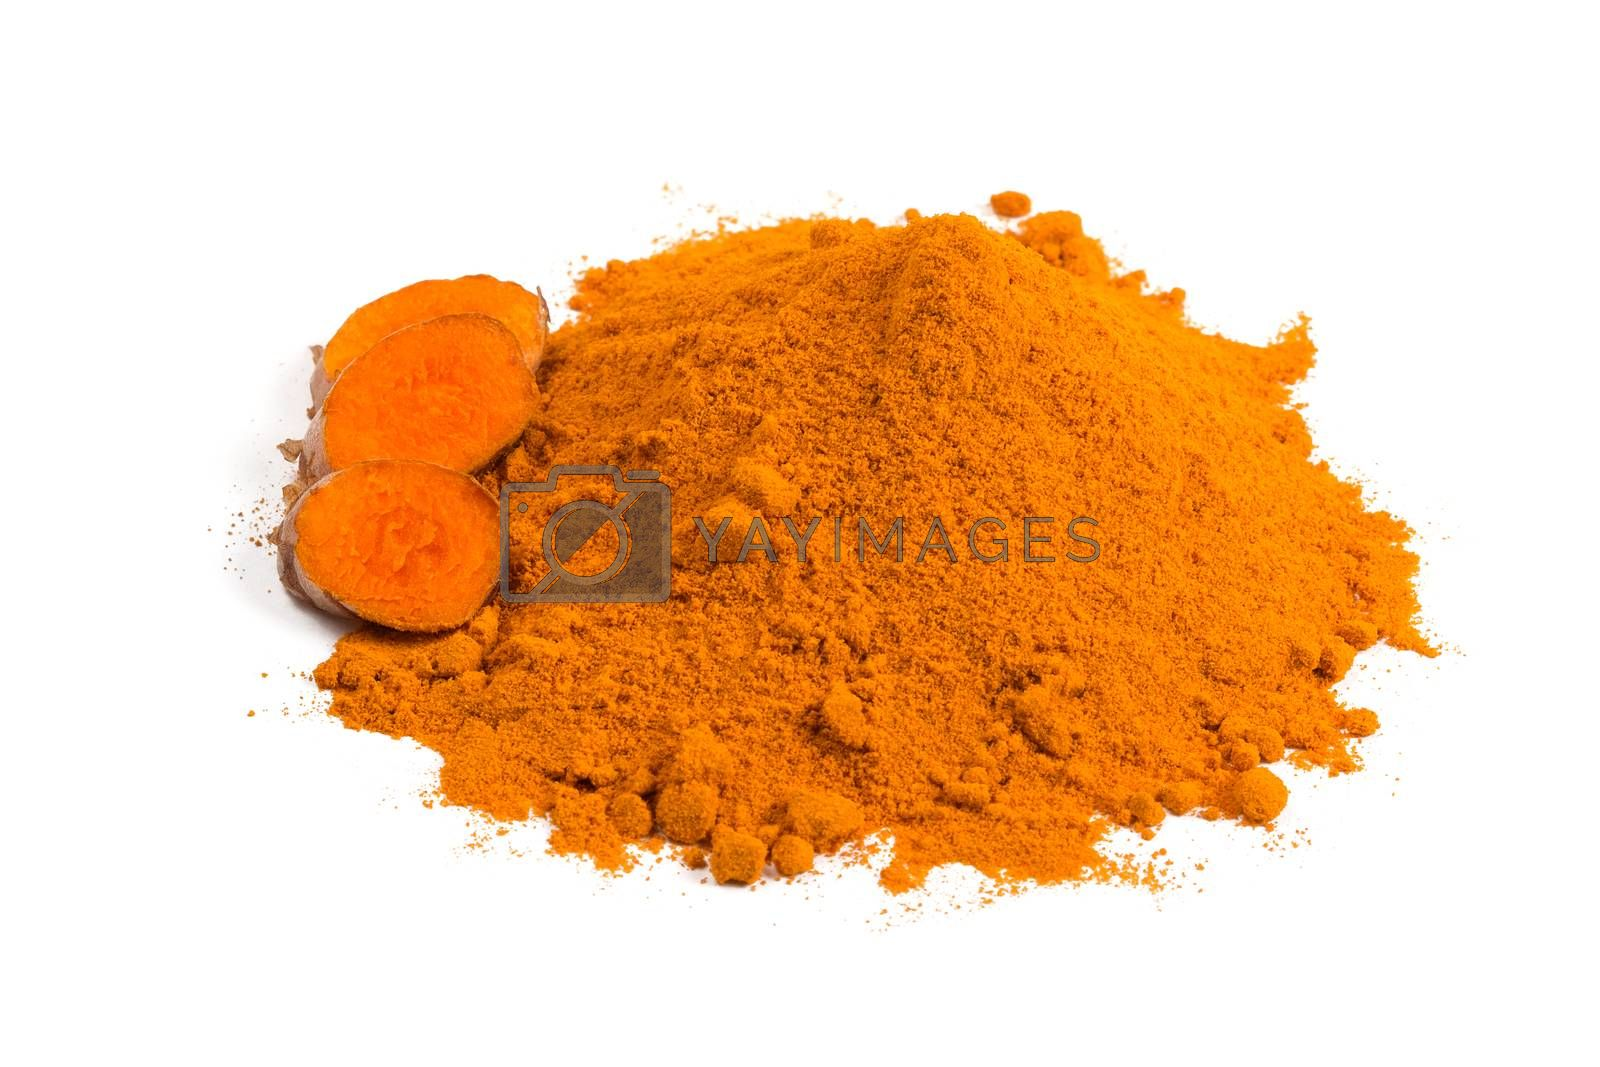 Turmeric rhizome and powder by ivo_13